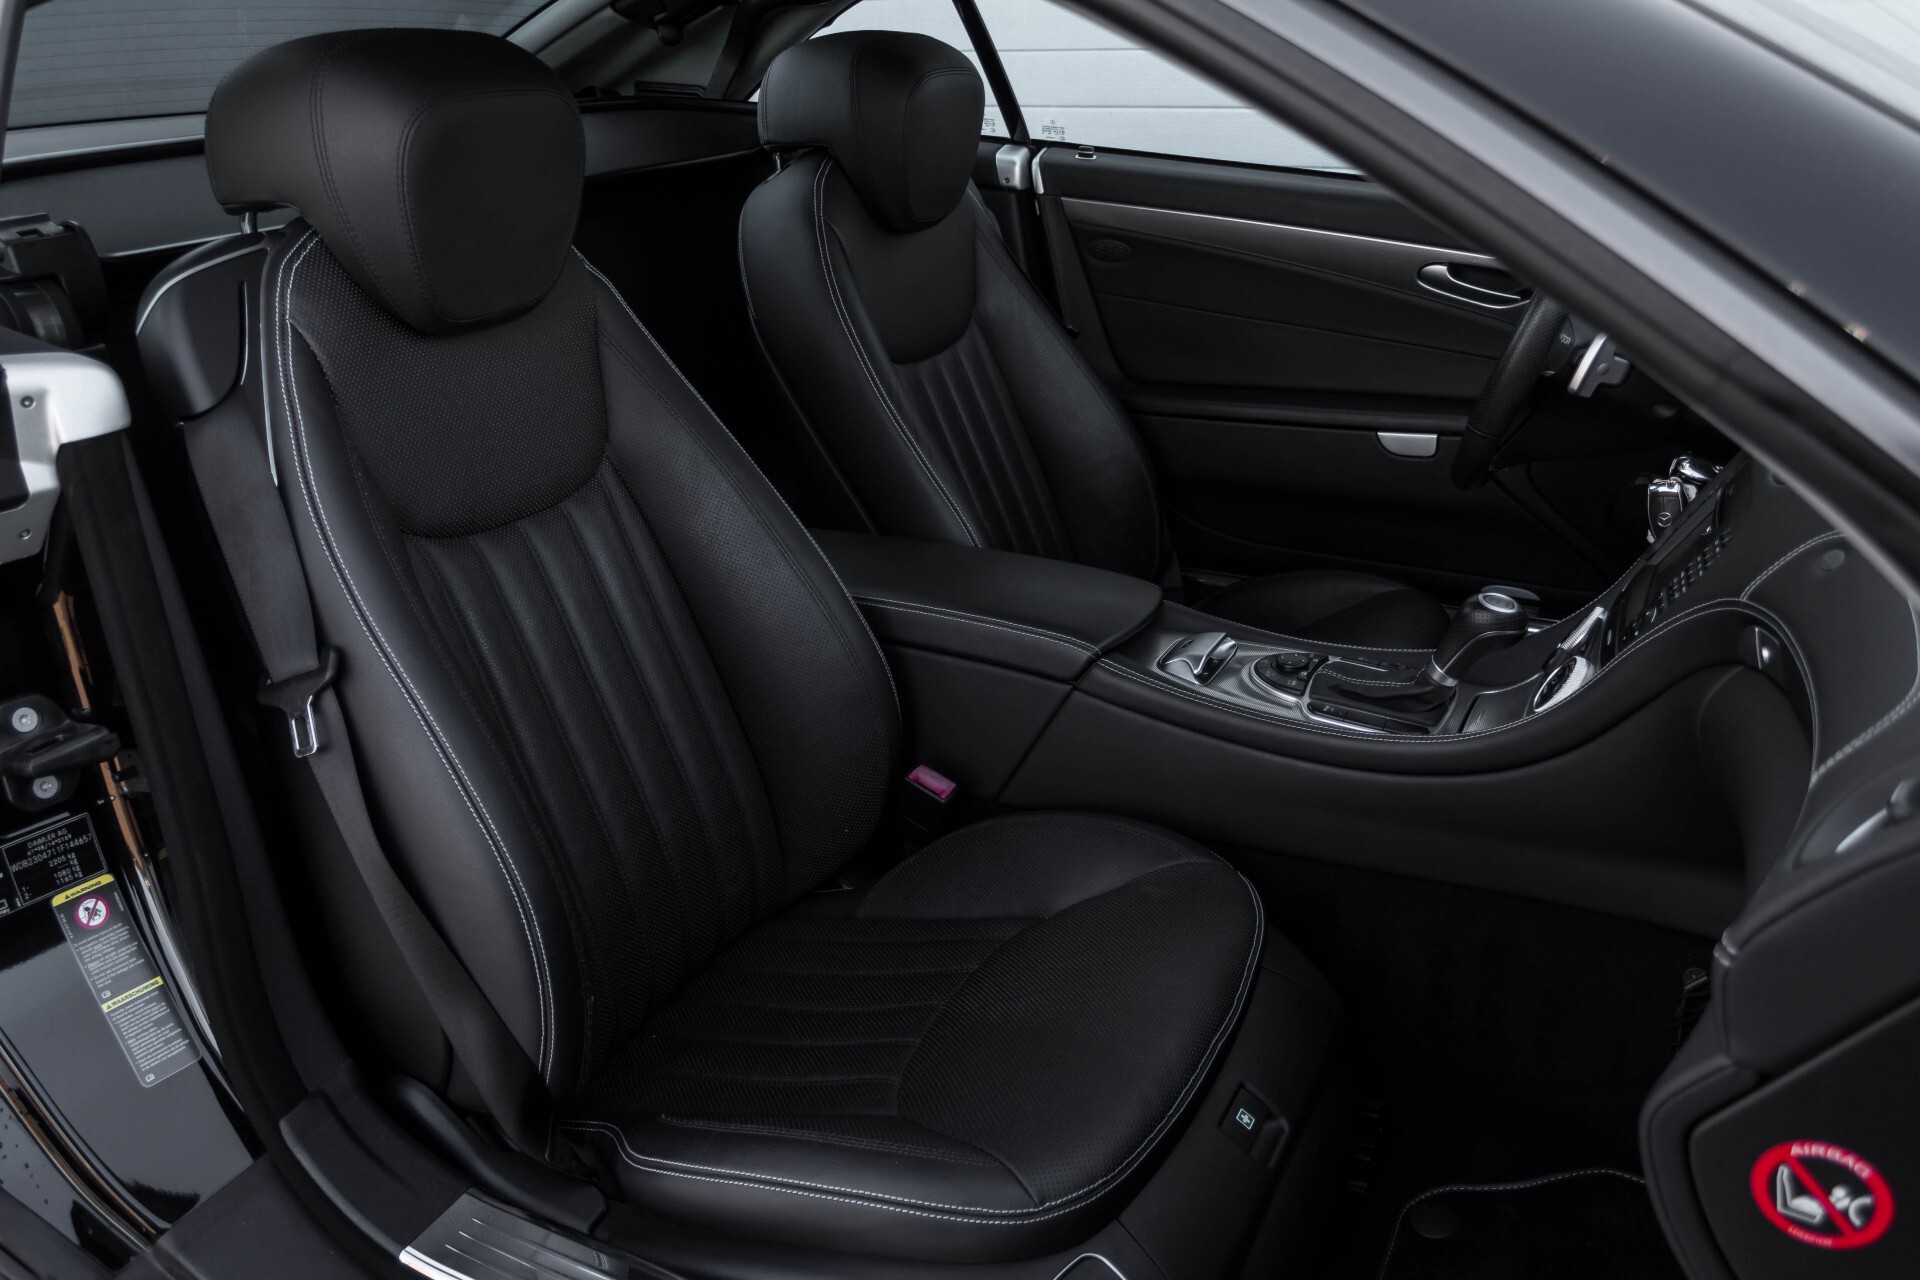 Mercedes-Benz SL-Klasse 500 Sport ABC/Harman-Kardon/Comand/Distronic Aut7 NP €175292 Foto 6